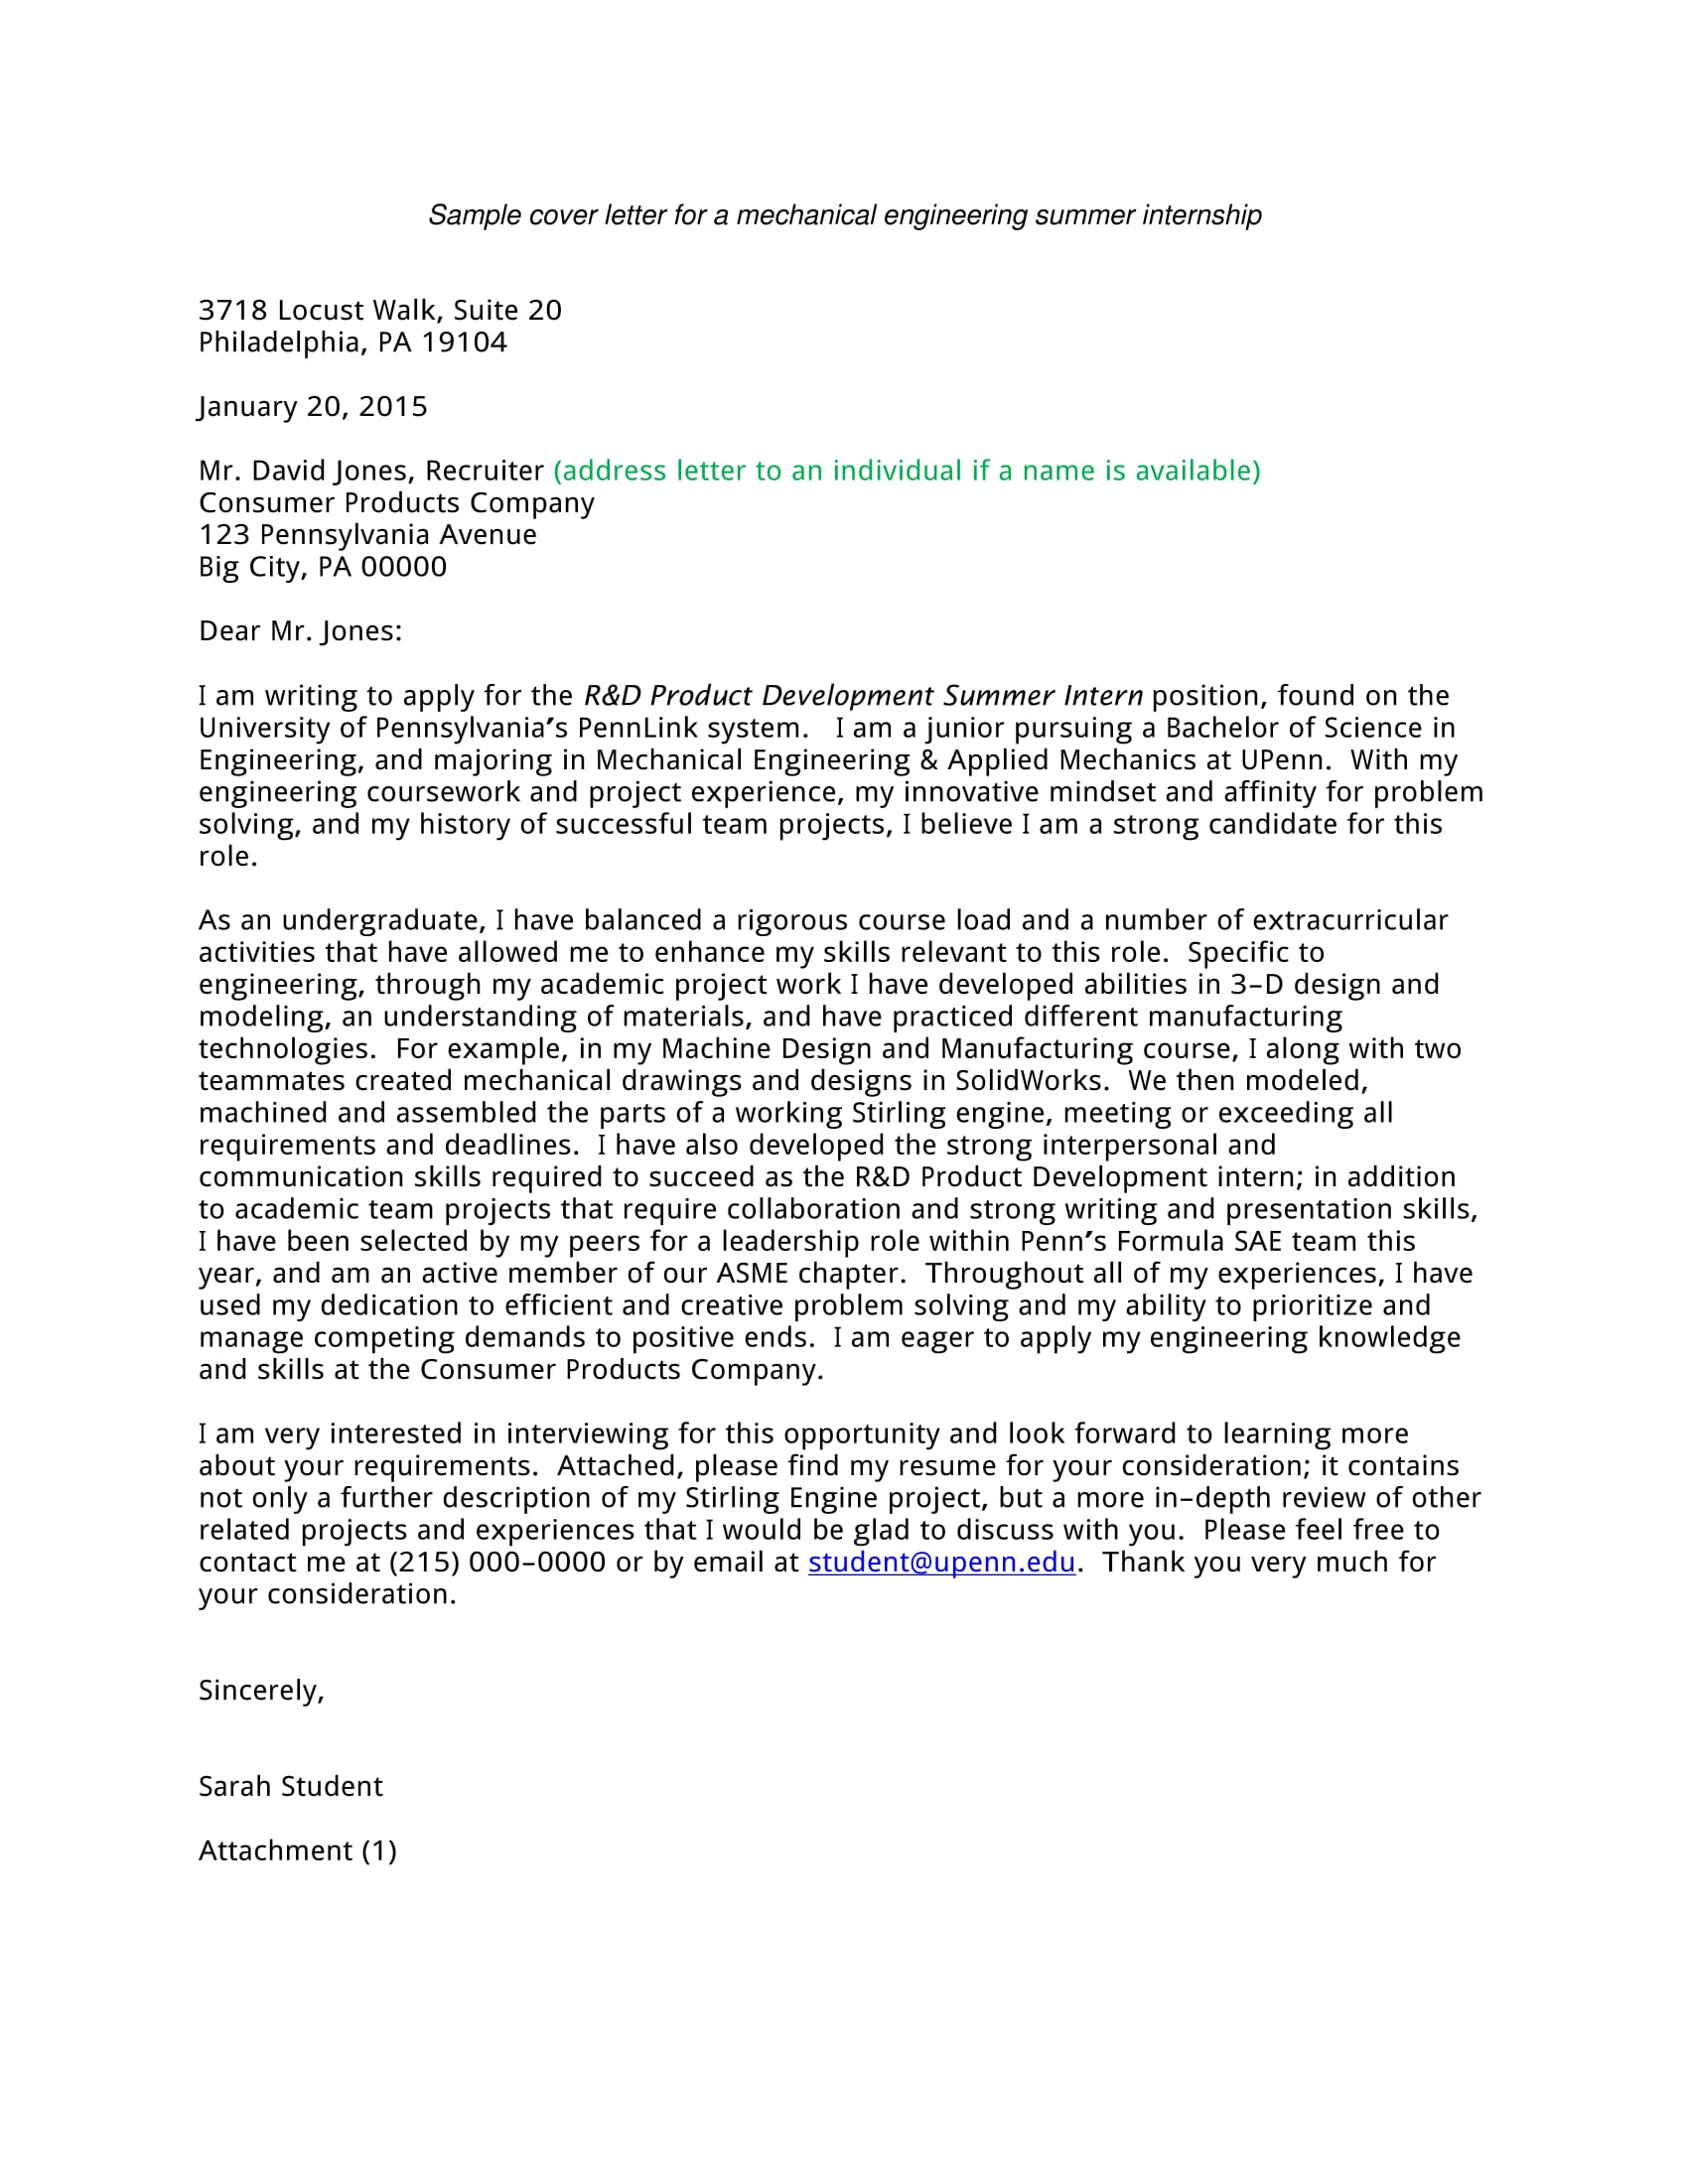 Internship Cover Letter Samples from i1.wp.com